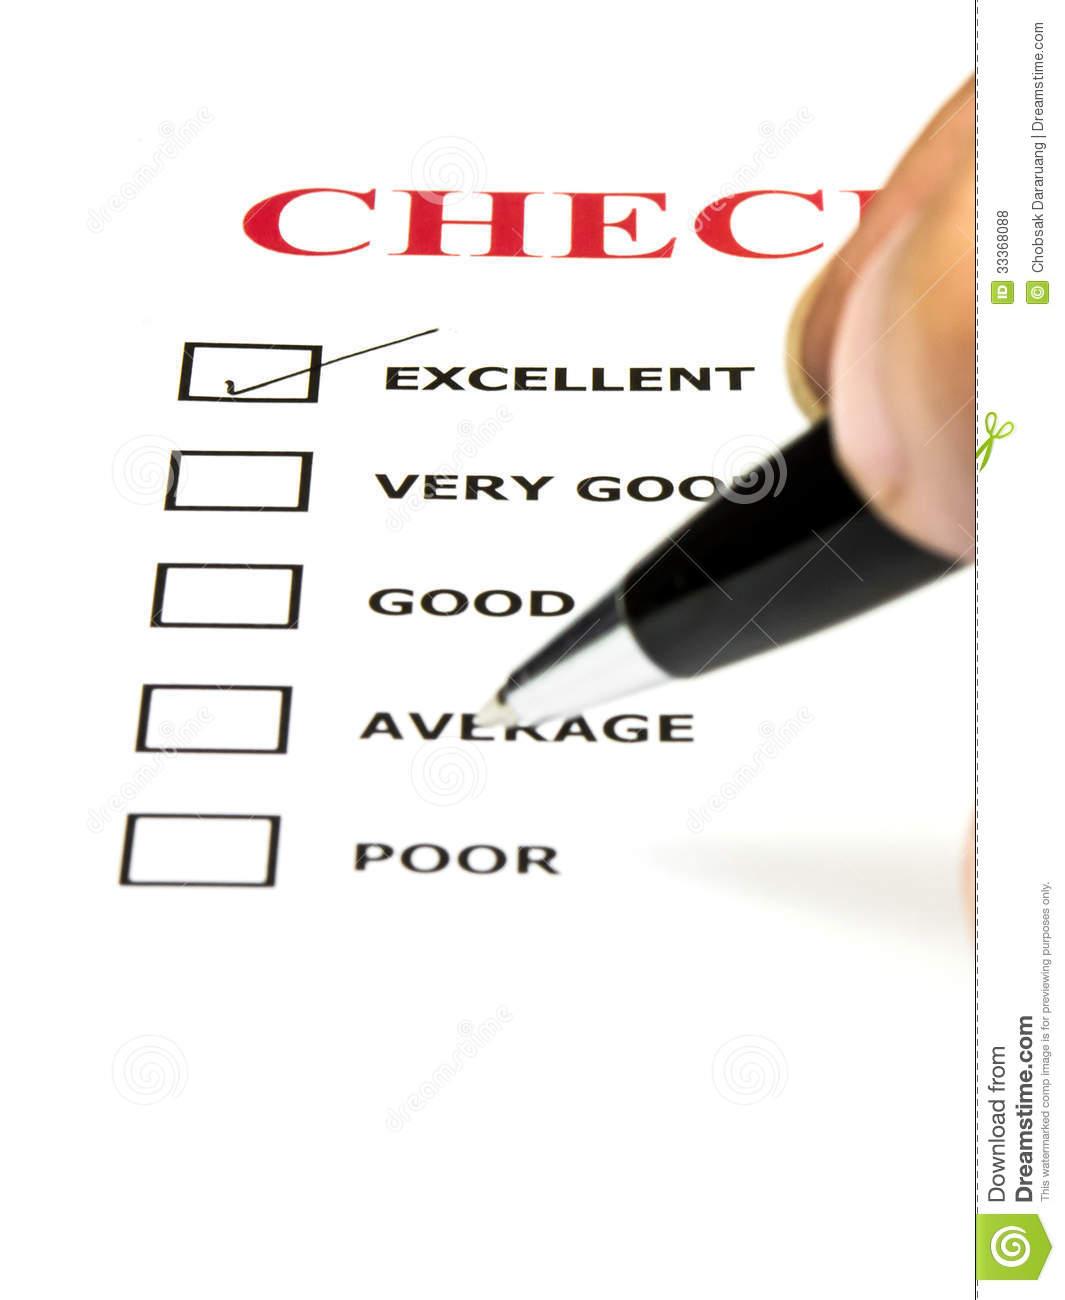 002 Essay Example Check List Survay Paper Close Up Angled Shot Survey Form Tick Excellent Box Customer Service Unique Checking Services Persuasive Checklist Pdf Checker Grammar Punctuation Free Full